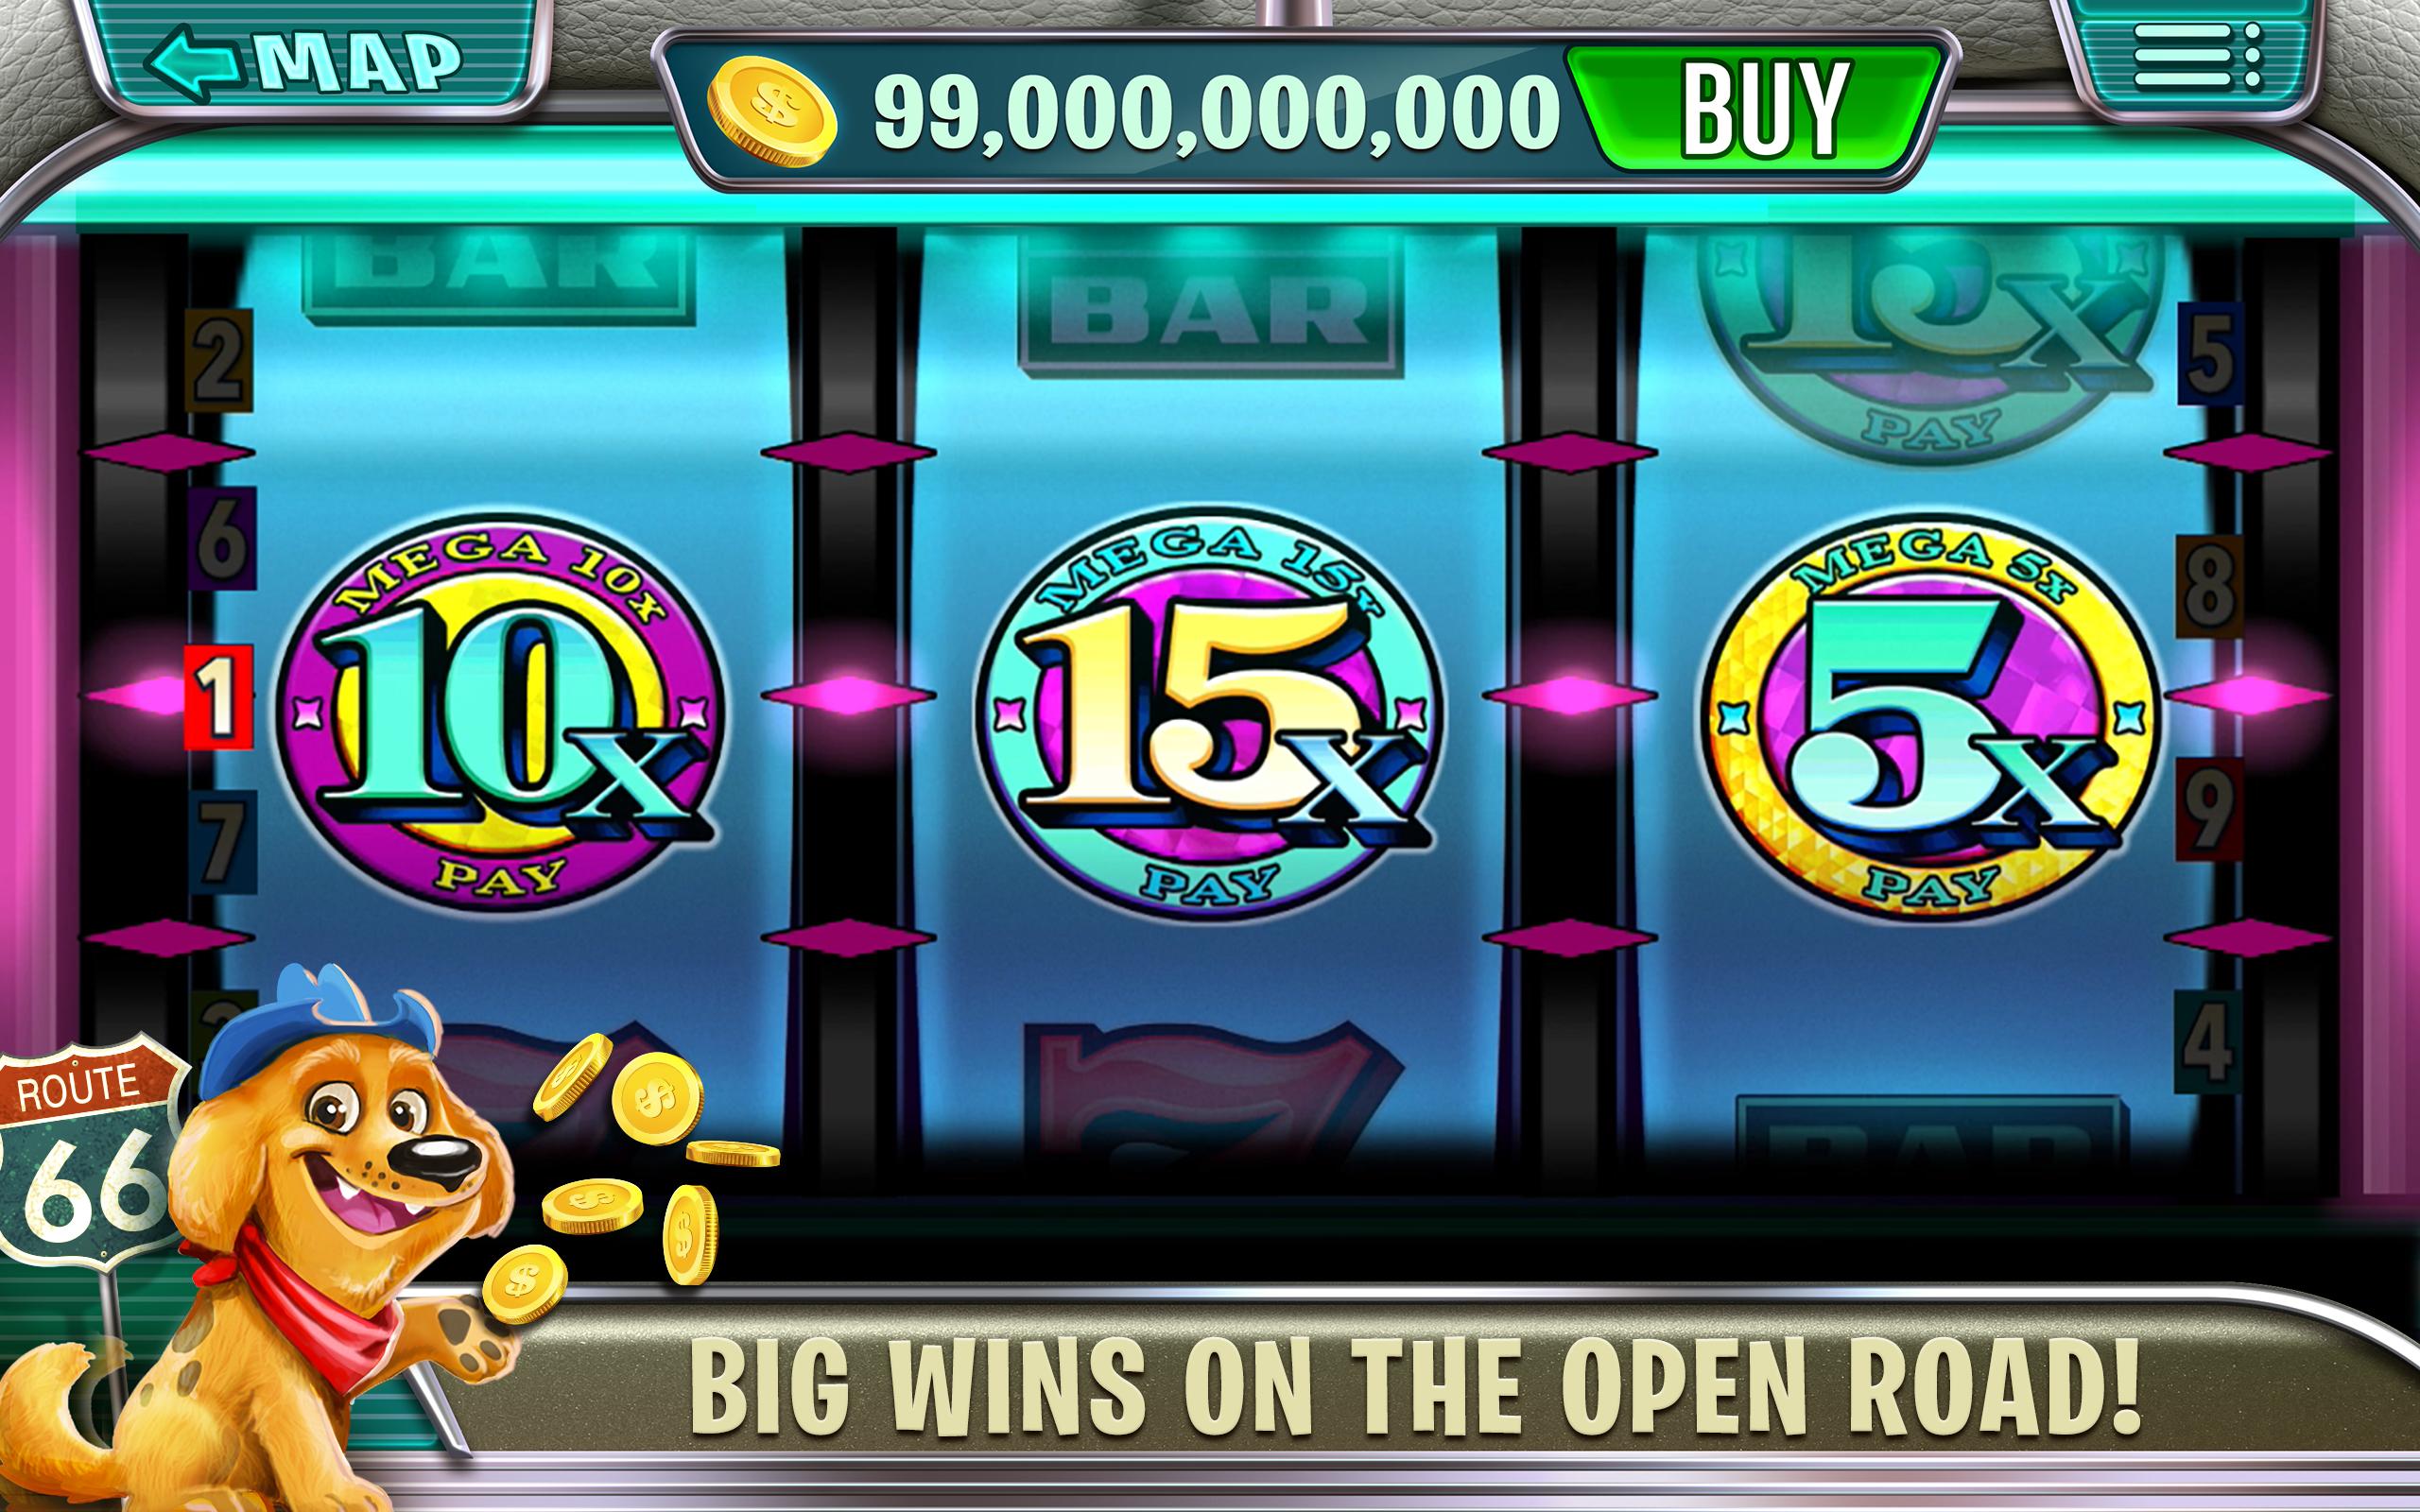 Road trip slot machine belterra casino vevay